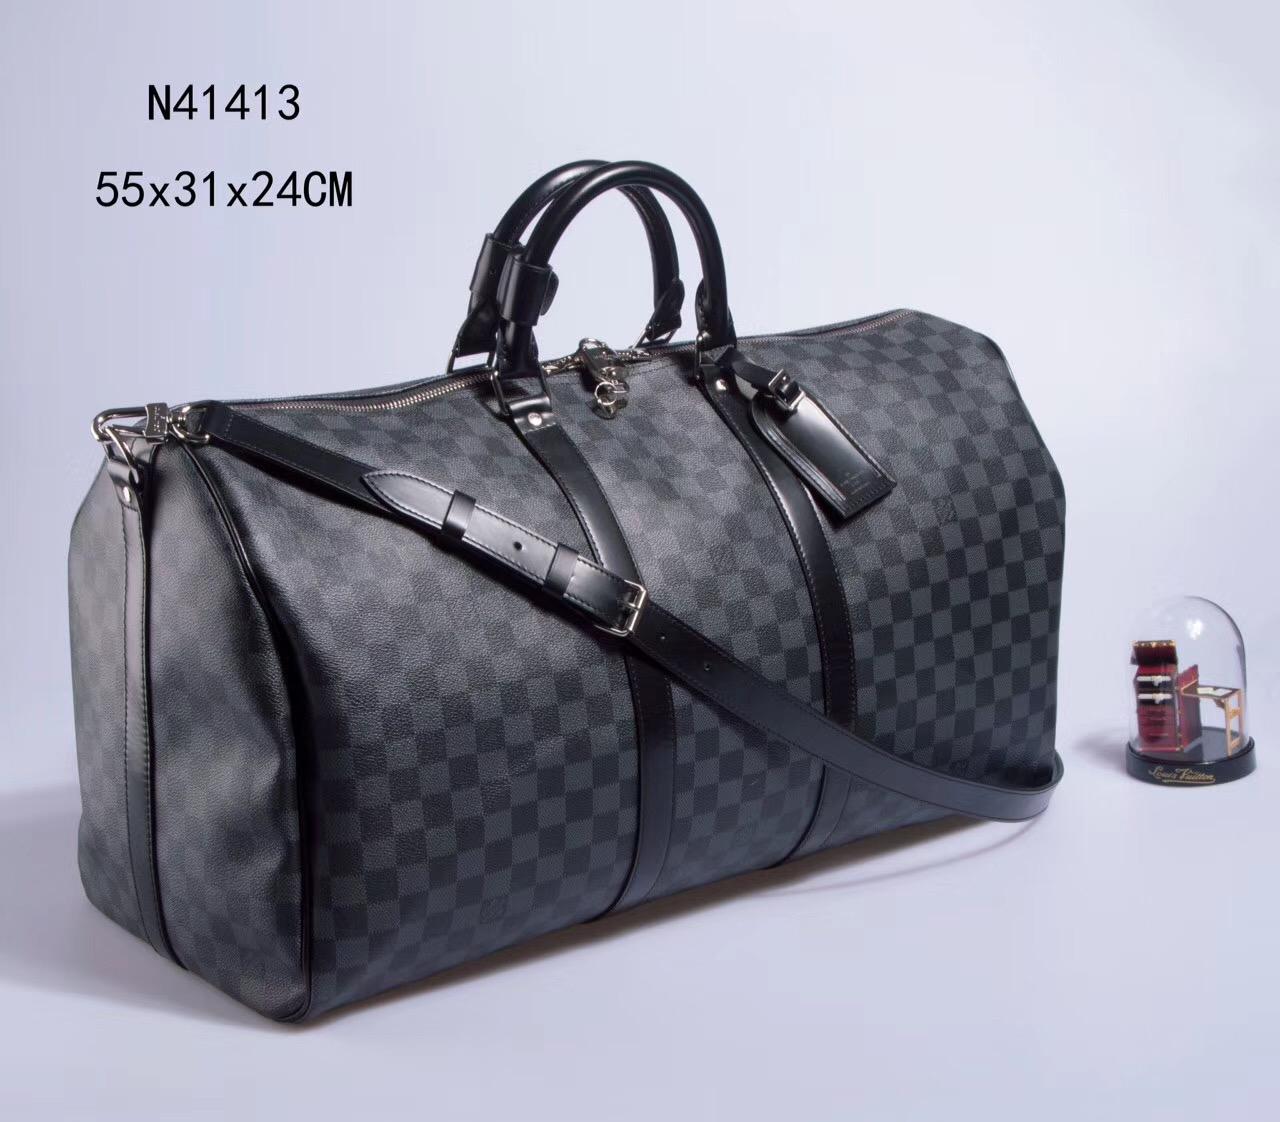 2e0d3b04f9872 Men LV Louis Vuitton N41413 Keepall 55 Travelling Handbags Damier bags Gray  ...